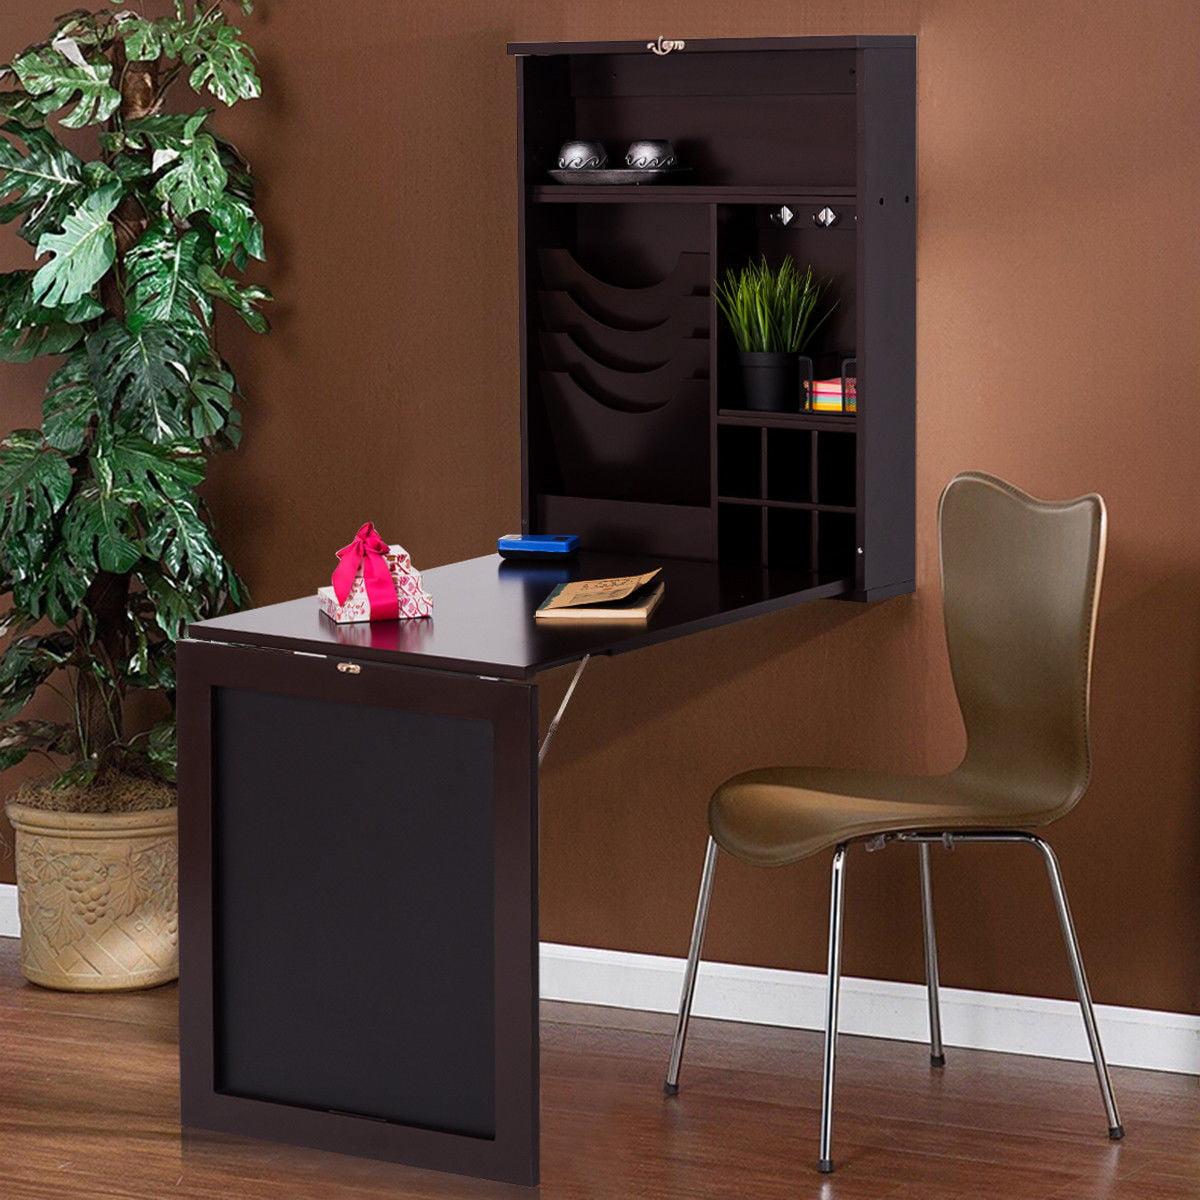 Costway Wall Mounted Table Convertible Desk Fold Out Space Saver Chalkboard Coffee Walmart Com Walmart Com